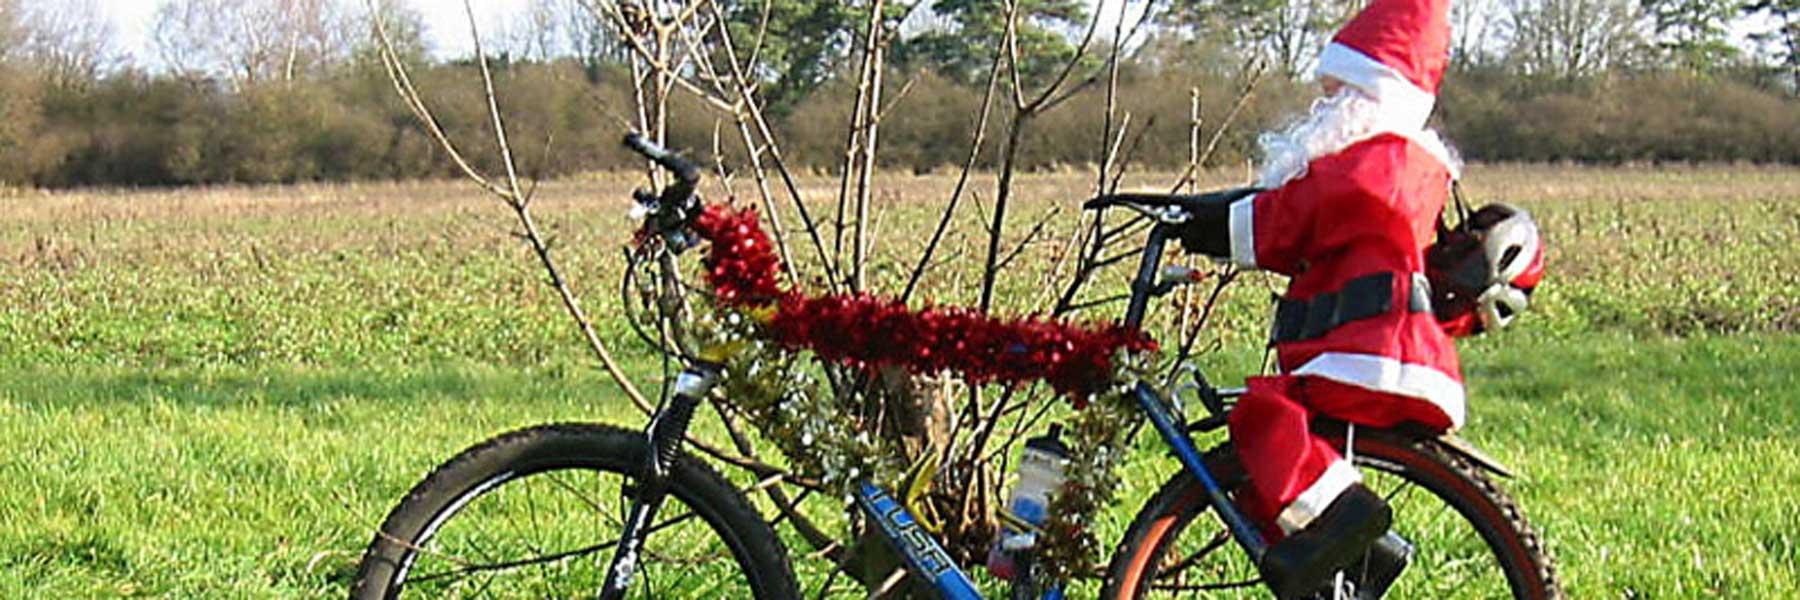 Nikolaus Tour Warndt-Biker 2006 Image